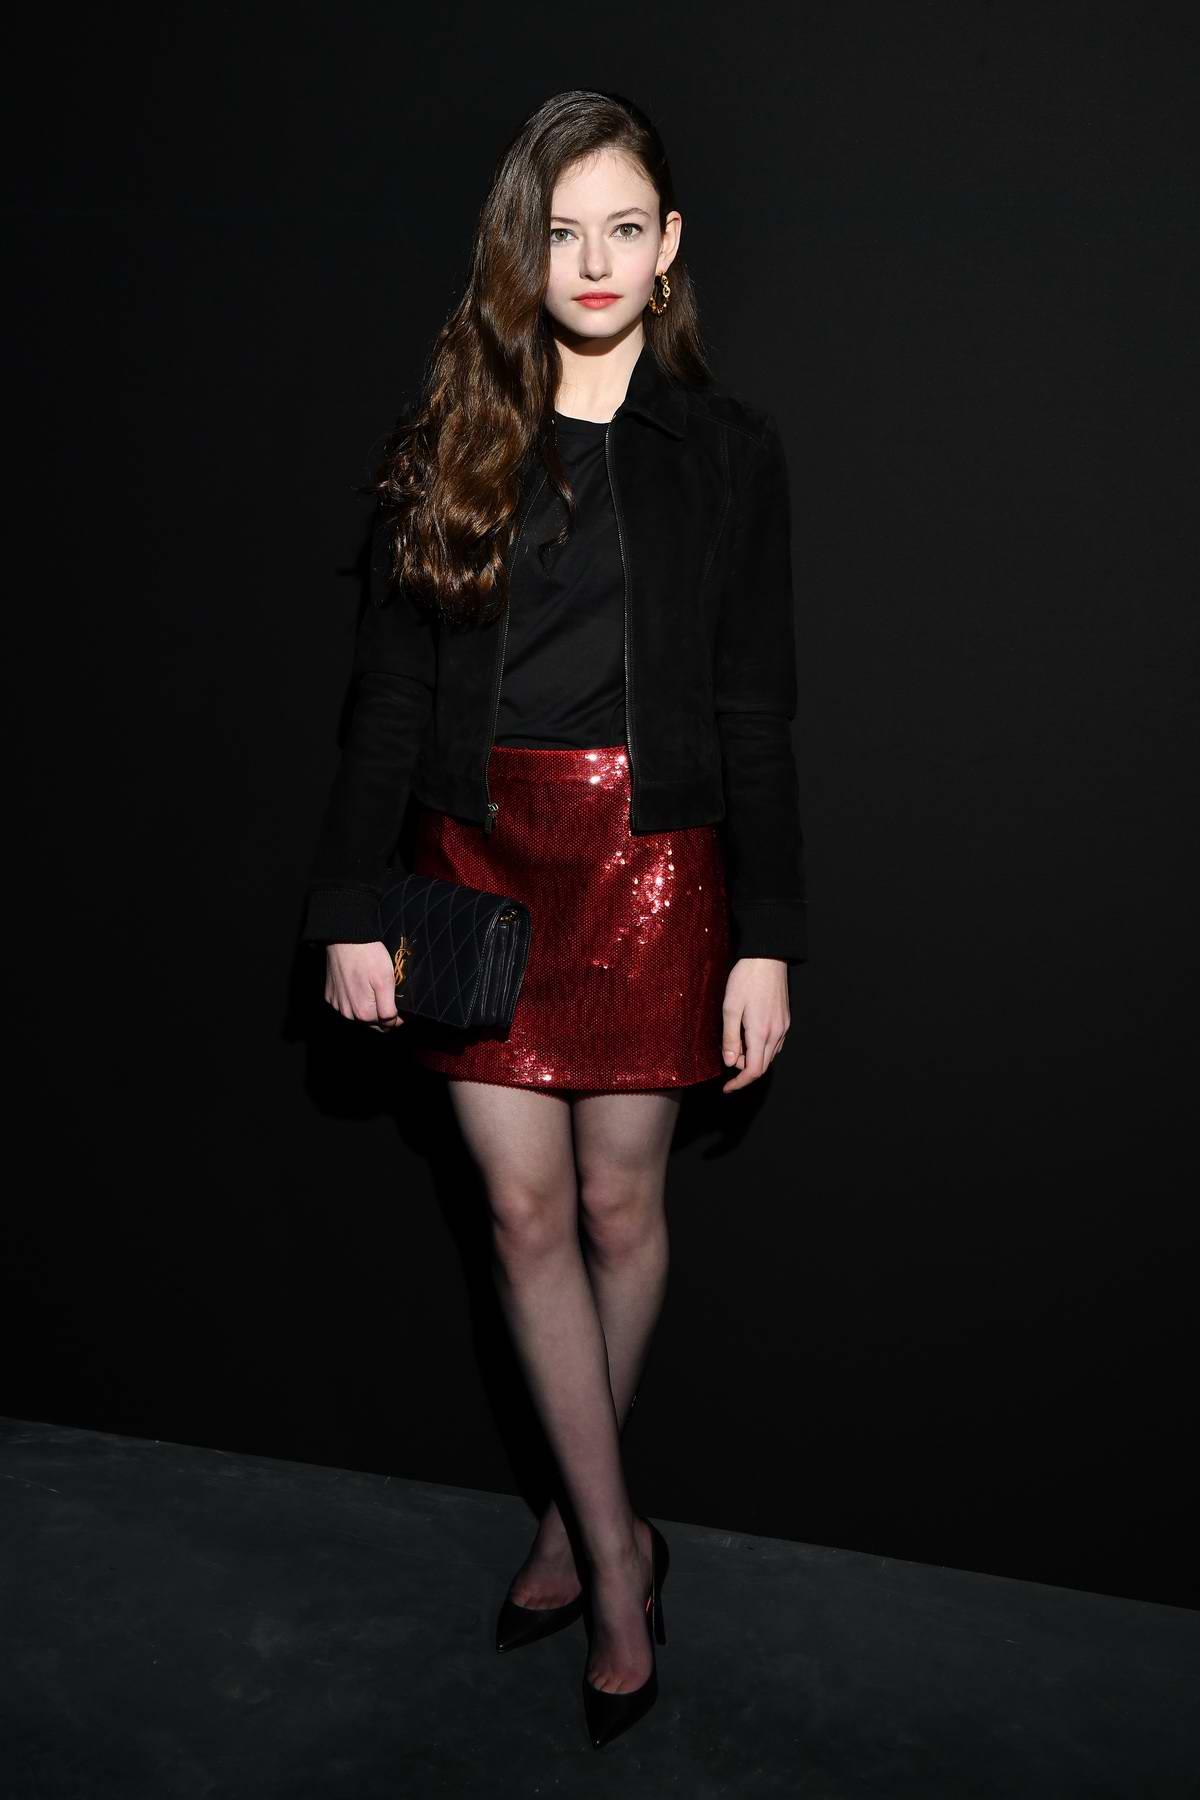 Mackenzie Foy attends the Saint Laurent show during Paris Fashion Week Womenswear Fall/Winter 2019/2020 in Paris, France